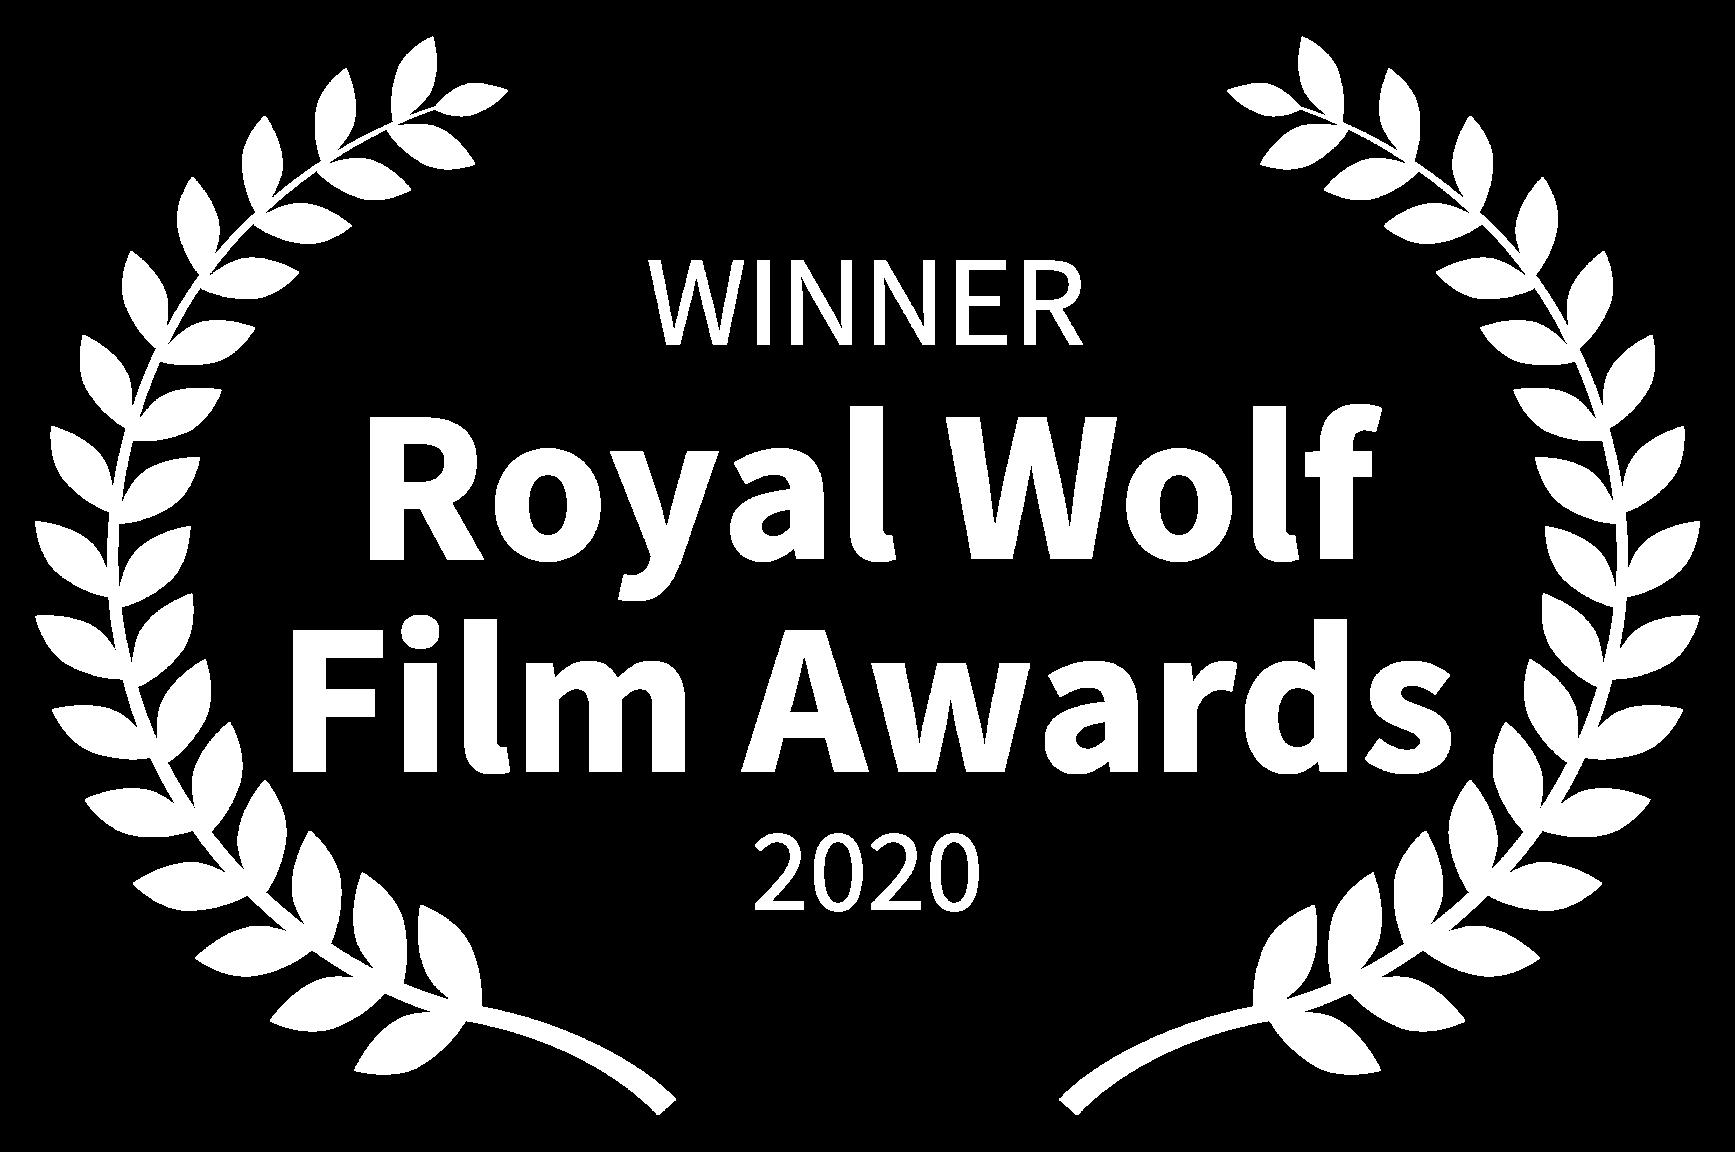 WINNER - Royal Wolf Film Awards - 2020